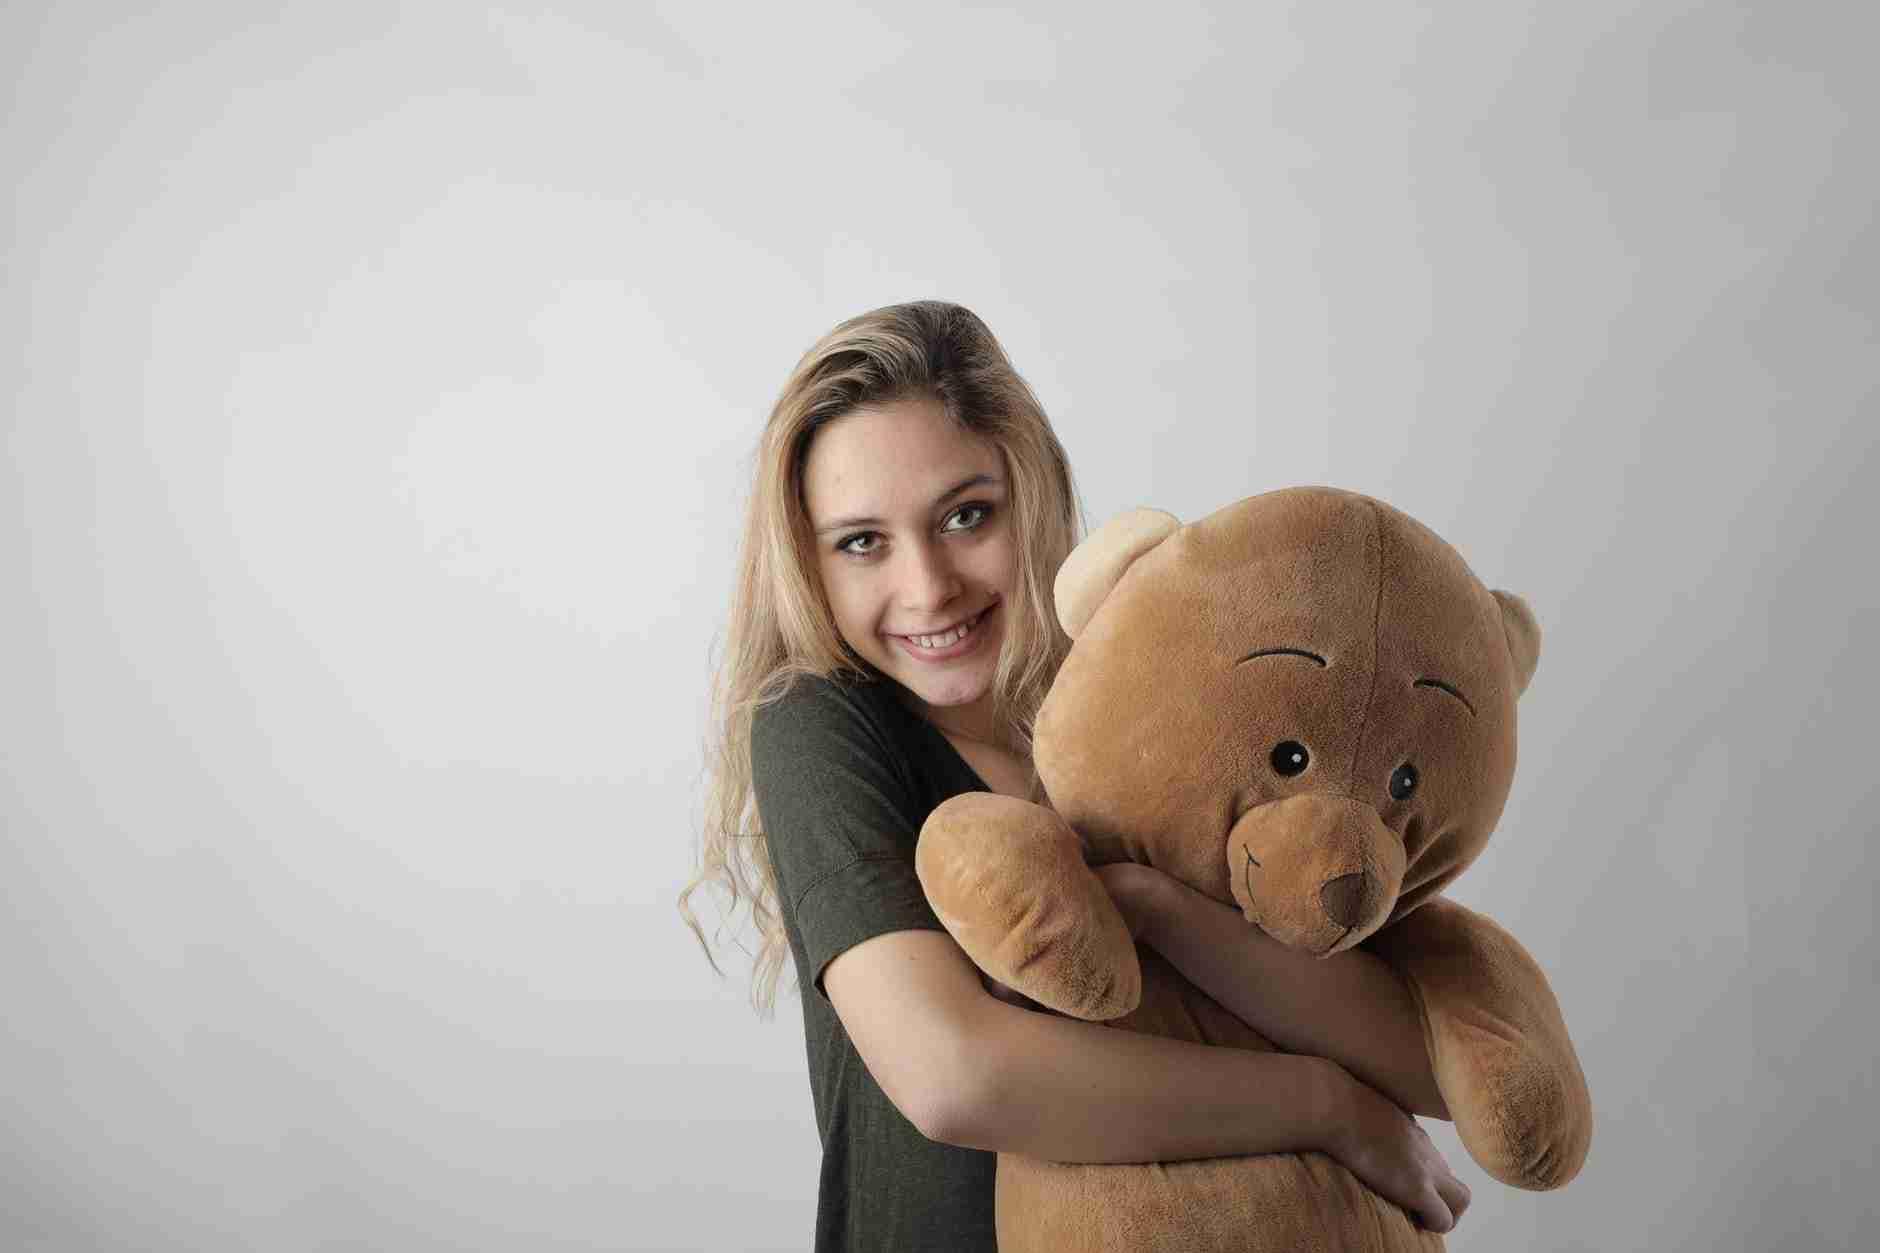 woman hugging a bear stuff toy